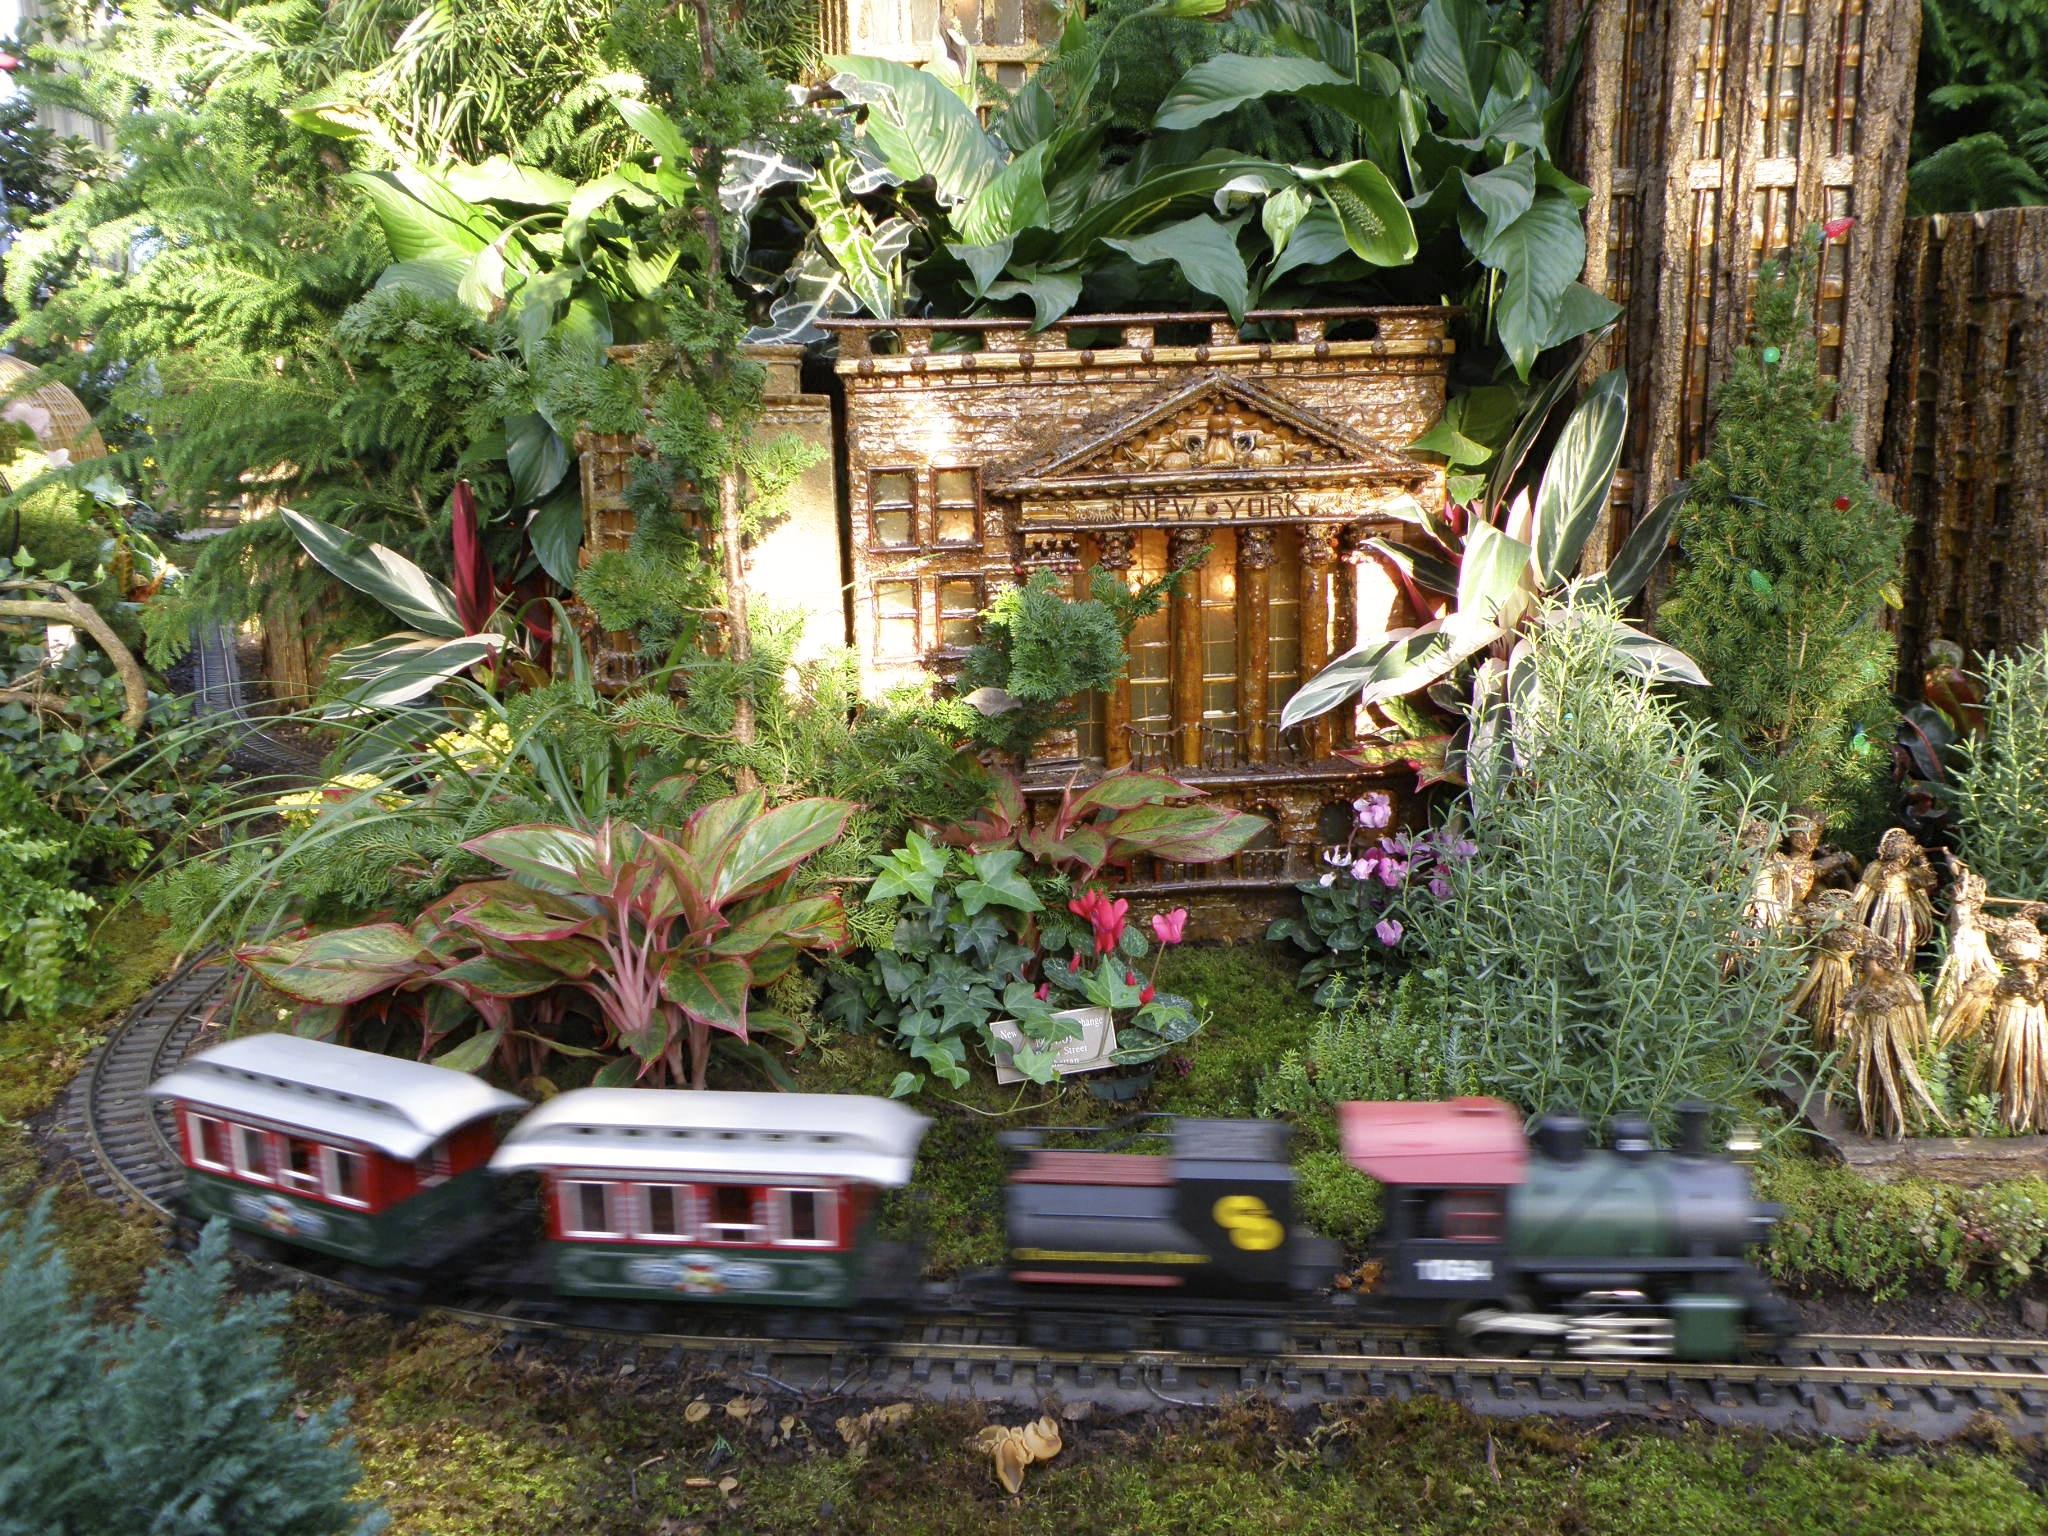 Nybg Holiday Train Show The Fiery Redhead Blog